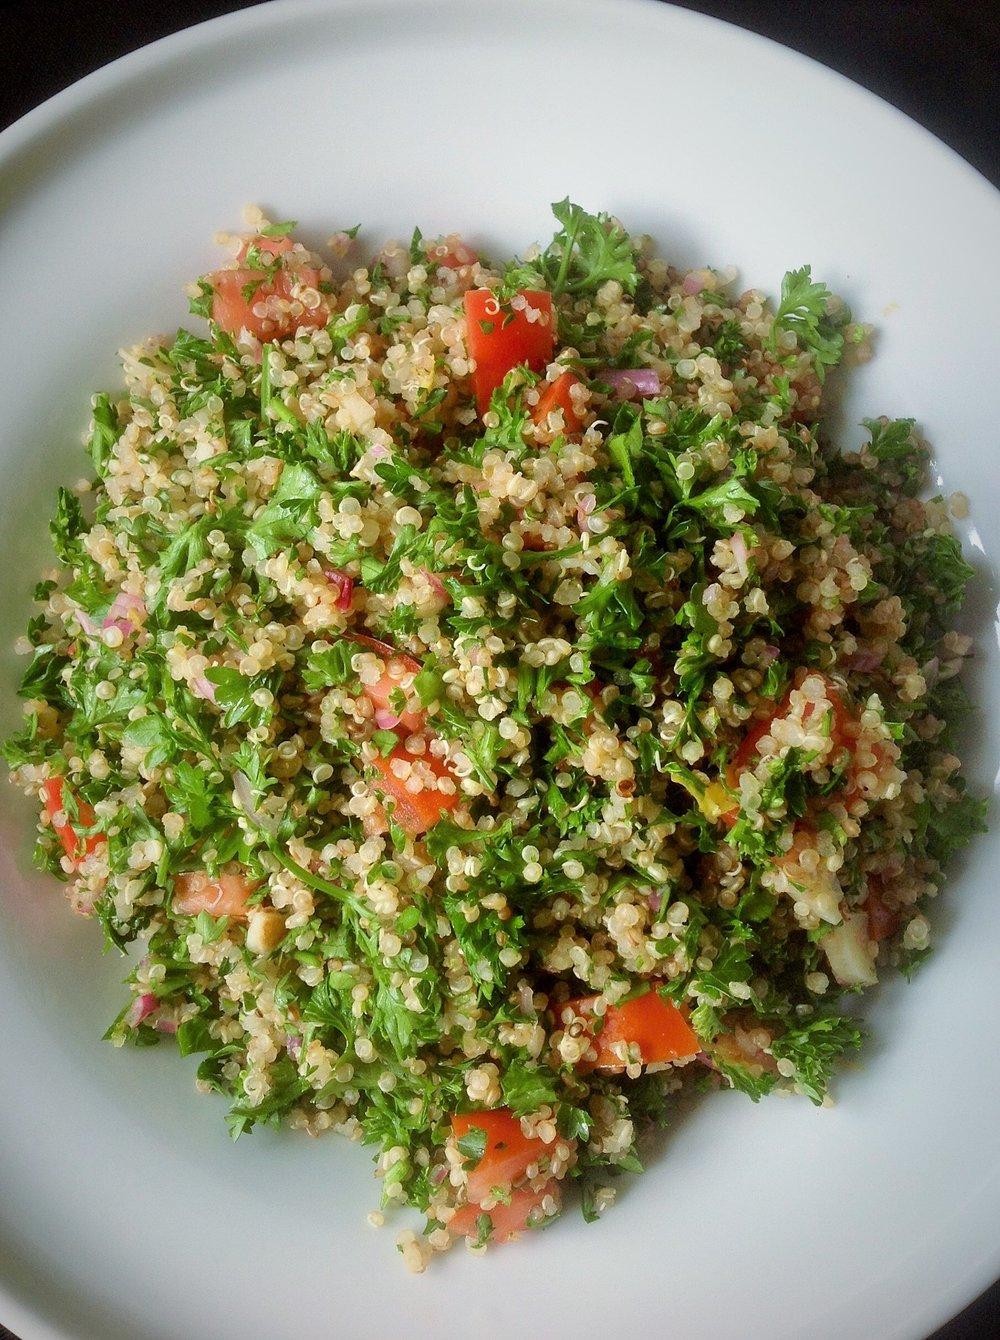 Quinoa Tabouleh - Healthy, Gluten-Free, Oil-Free, Whole Grain, Vegetarian Protein, Plant-Based, Vegan